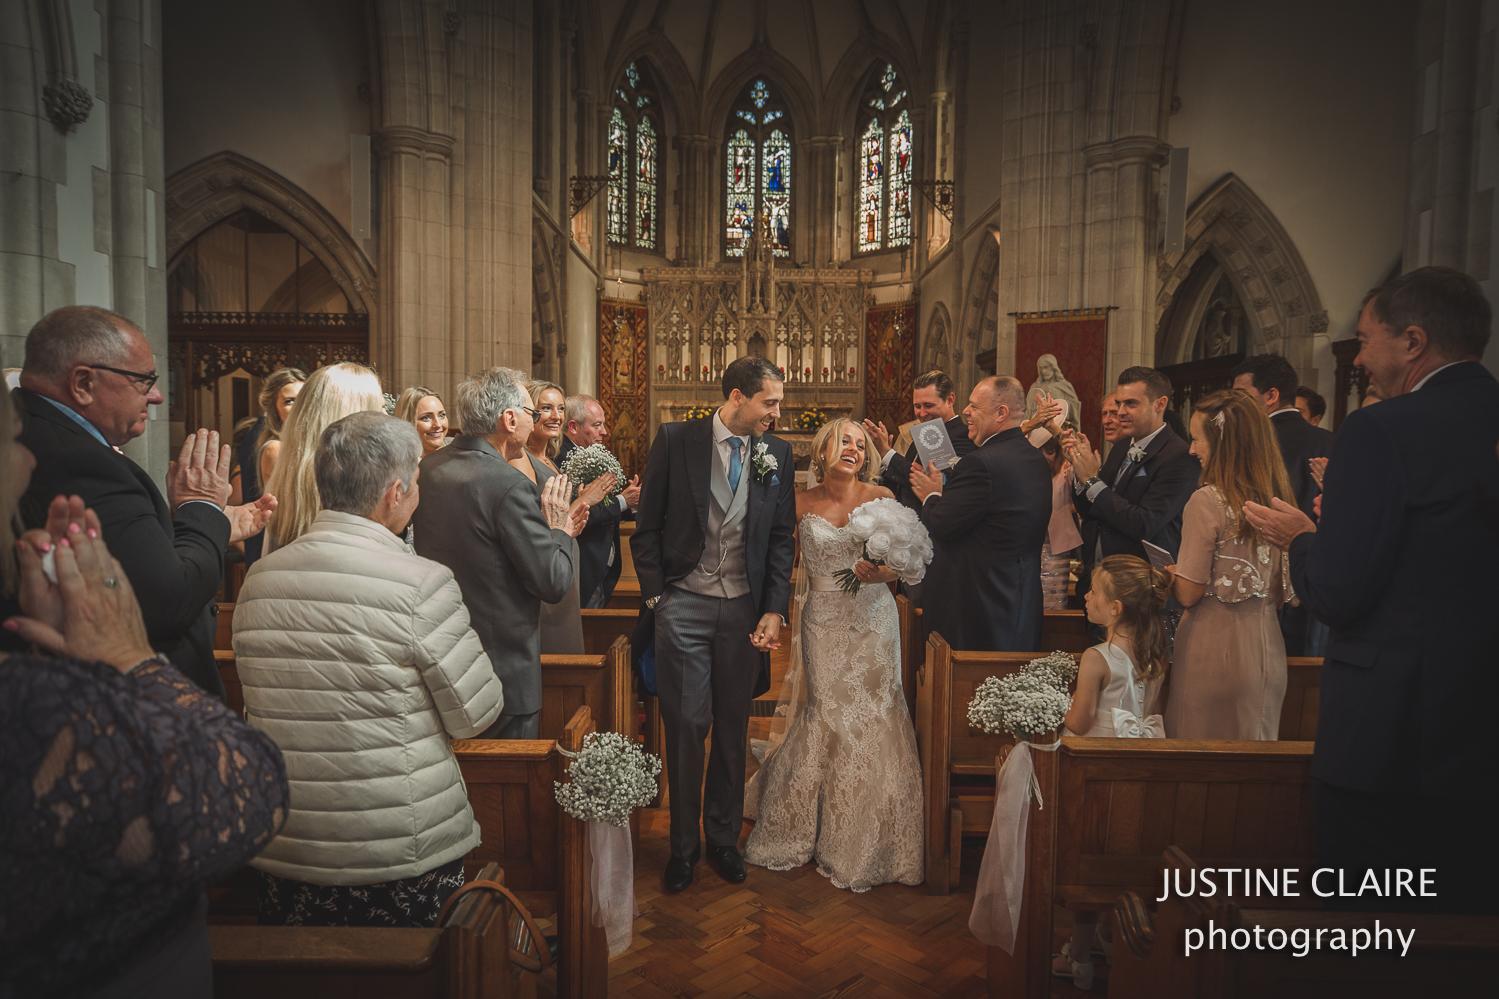 Wedding Photographers at Farbridge barn venue sussex-75.jpg